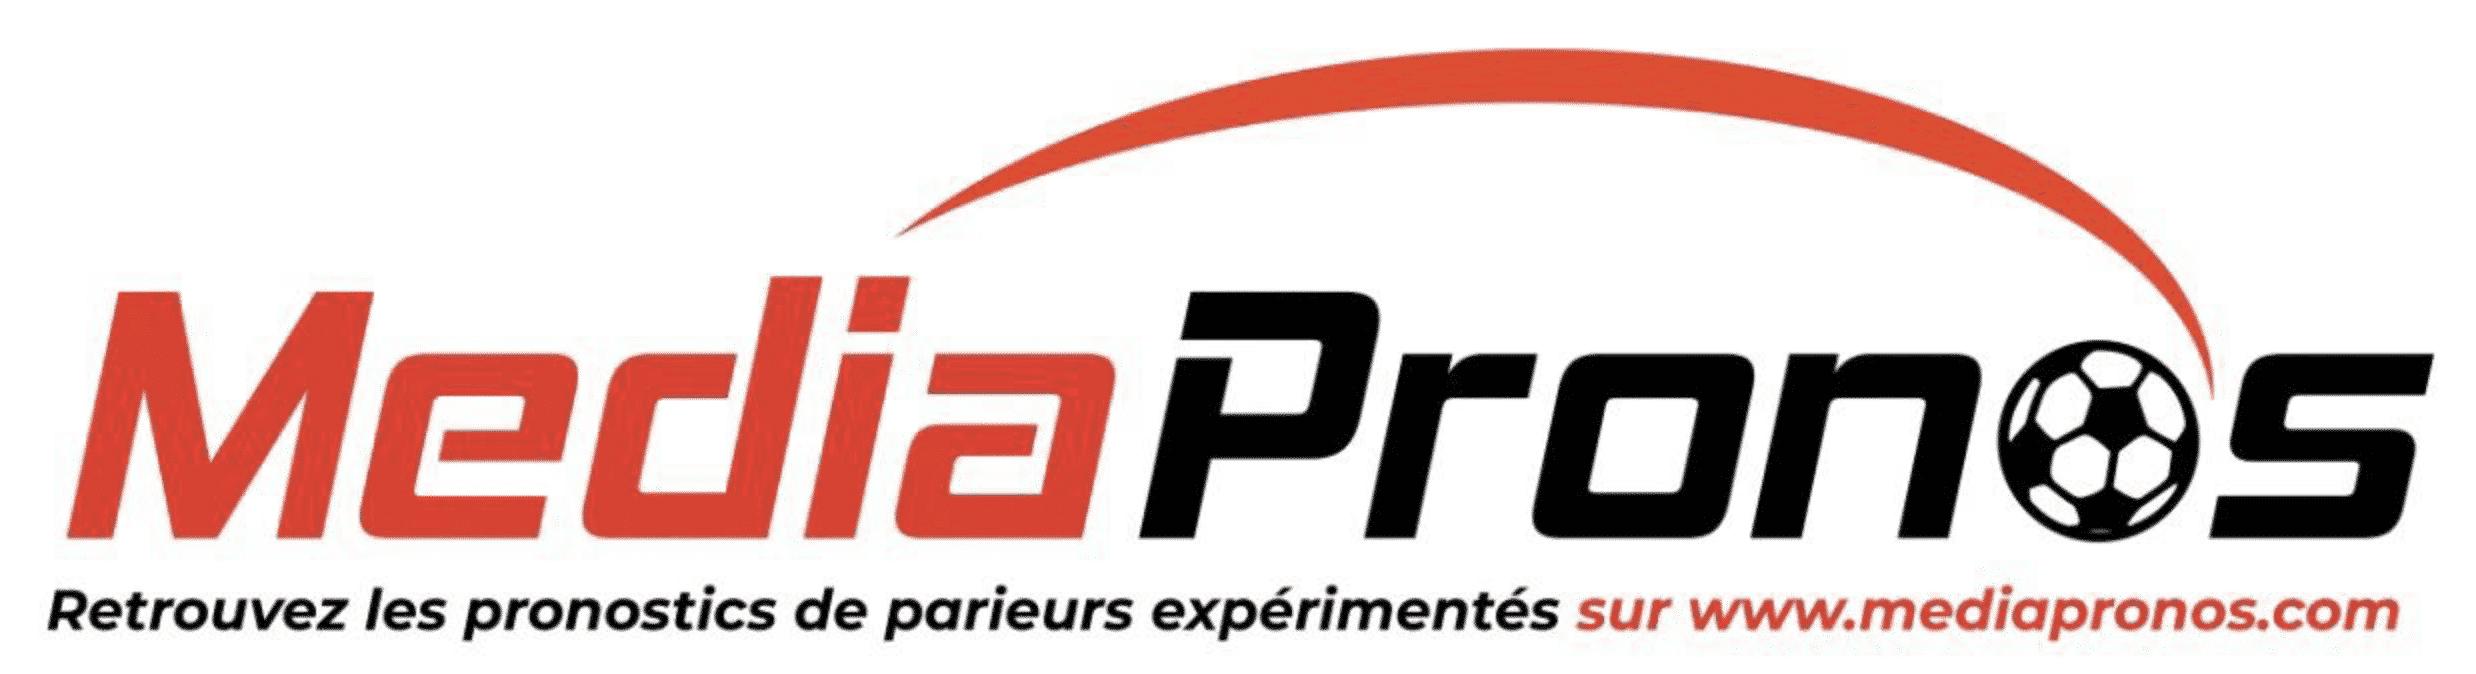 MediaPronos : pronostics, côtes, informations...